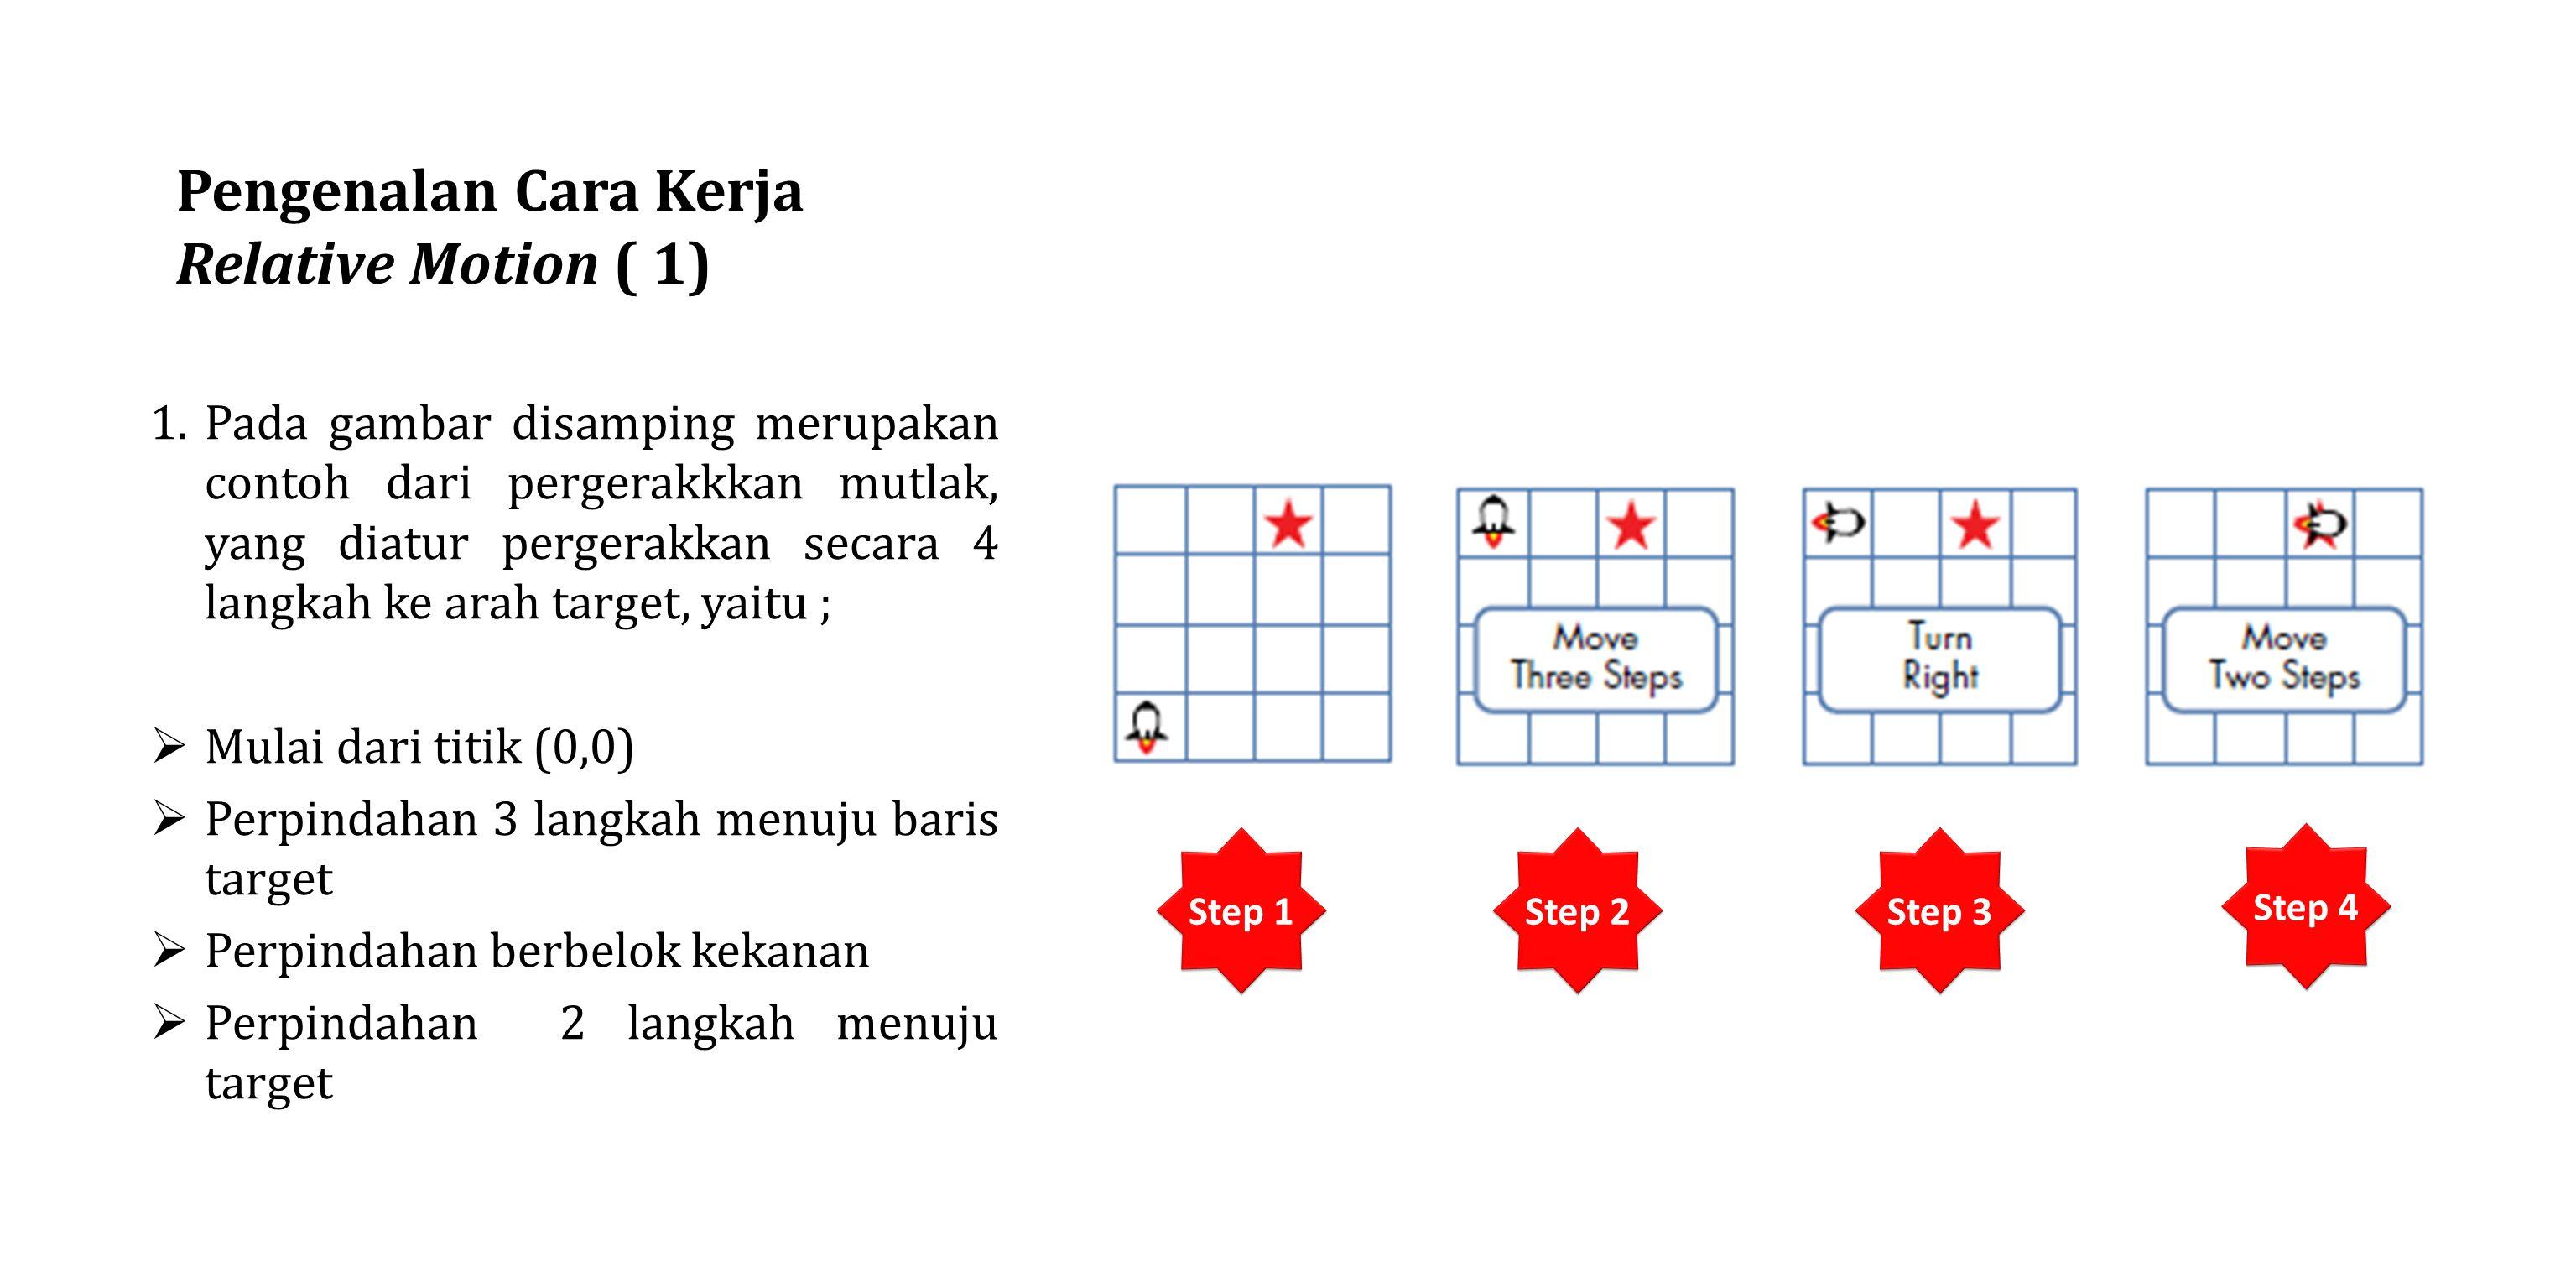 Pengenalan Cara Kerja Relative Motion ( 1) 1.Pada gambar disamping merupakan contoh dari pergerakkkan mutlak, yang diatur pergerakkan secara 4 langkah